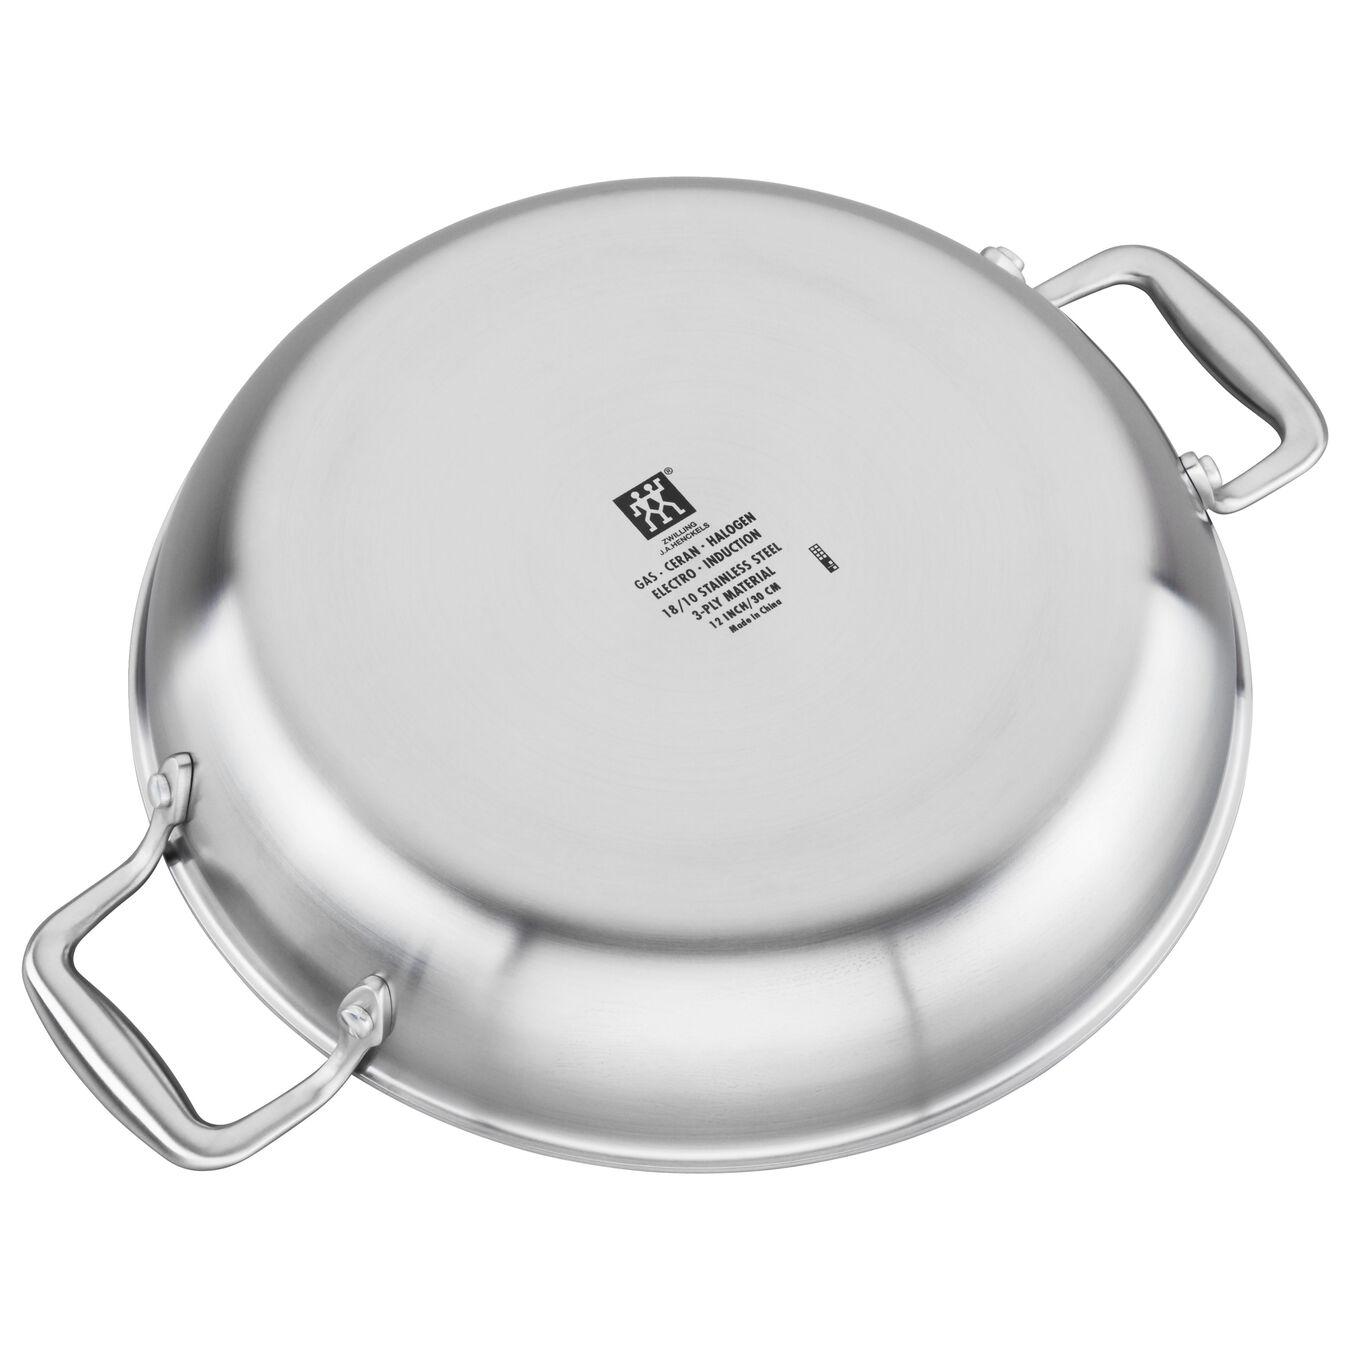 3-ply 4-qt Stainless Steel Ceramic Nonstick Braiser,,large 2